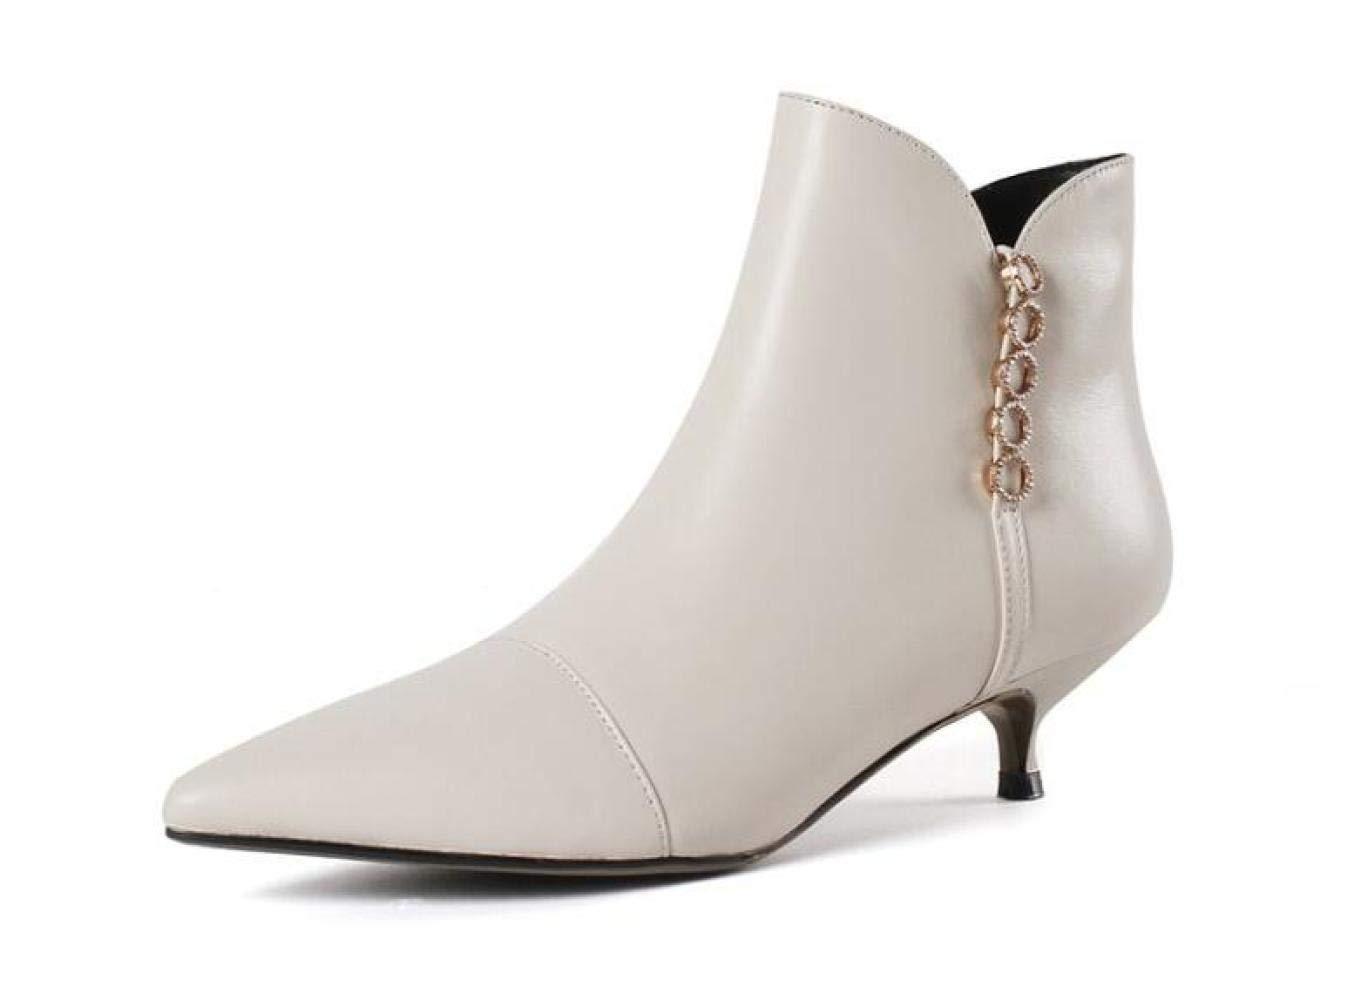 QINGMM Frauen Spitzen Metall Dekorative Stiefeletten 2018 Herbst Winter Mode Leder Partei Stiefel Neuheit Niedrige Ferse Schuhe